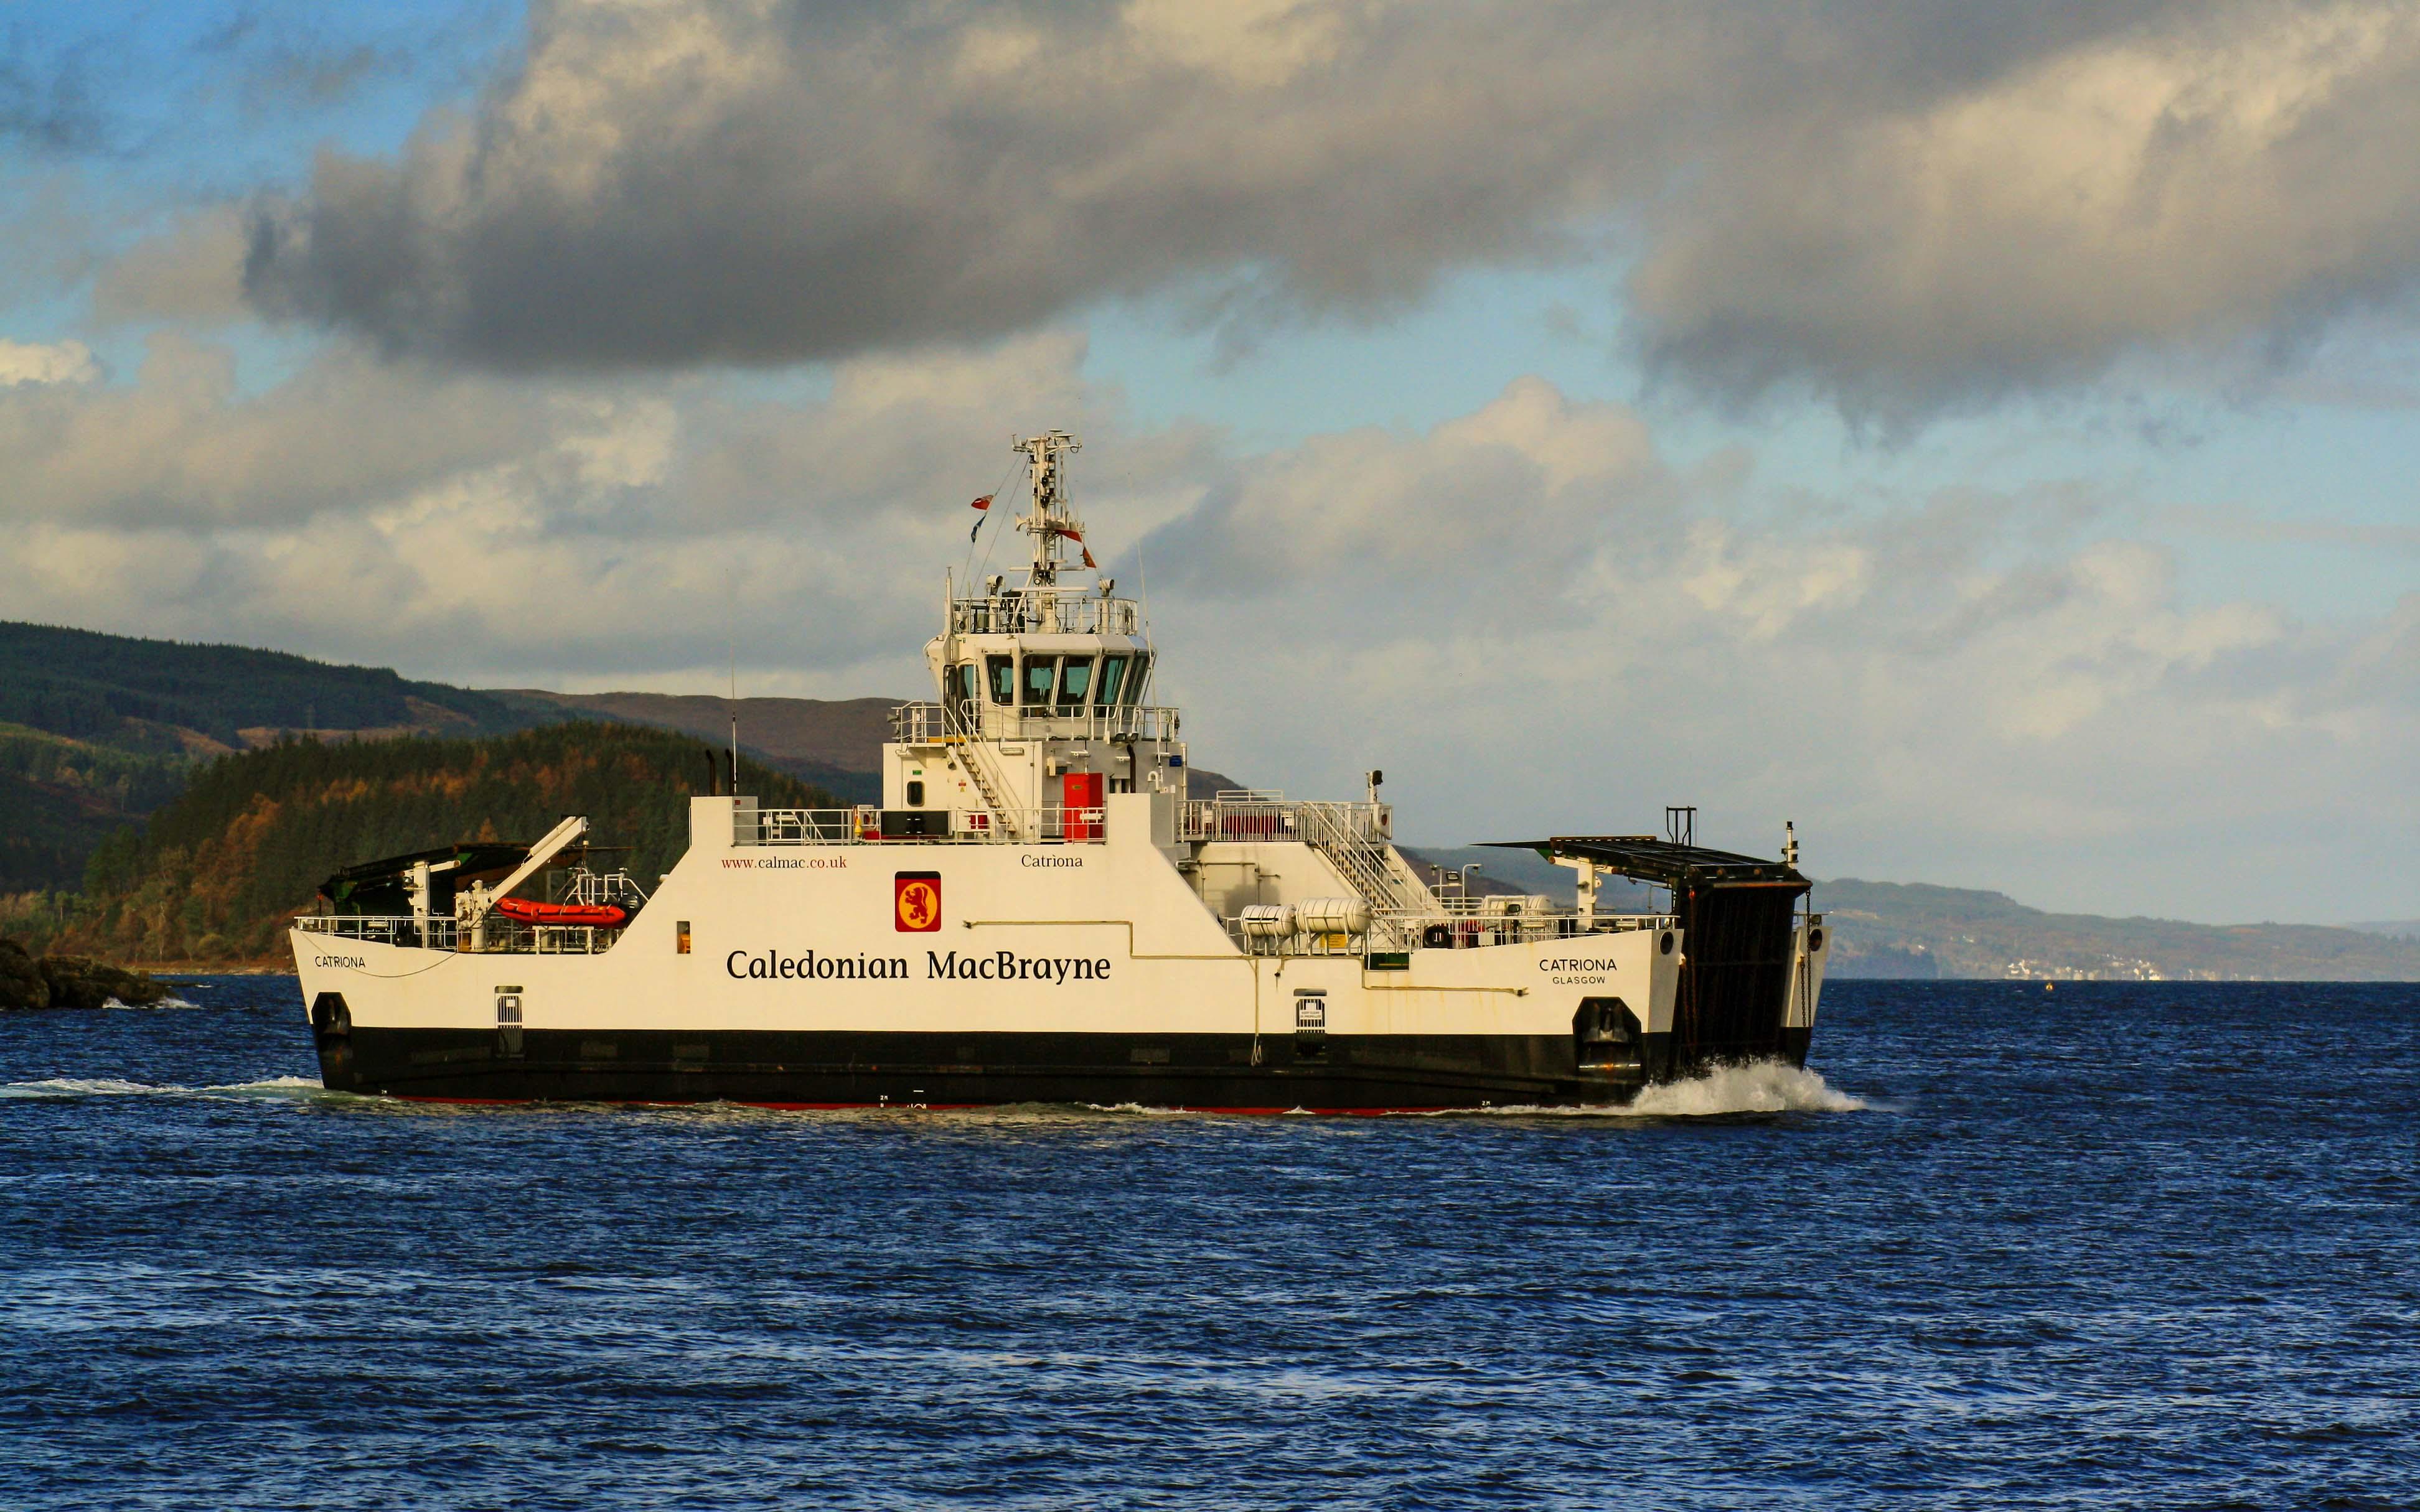 Catriona leaving Tarbert (Photo: SoC Crew)